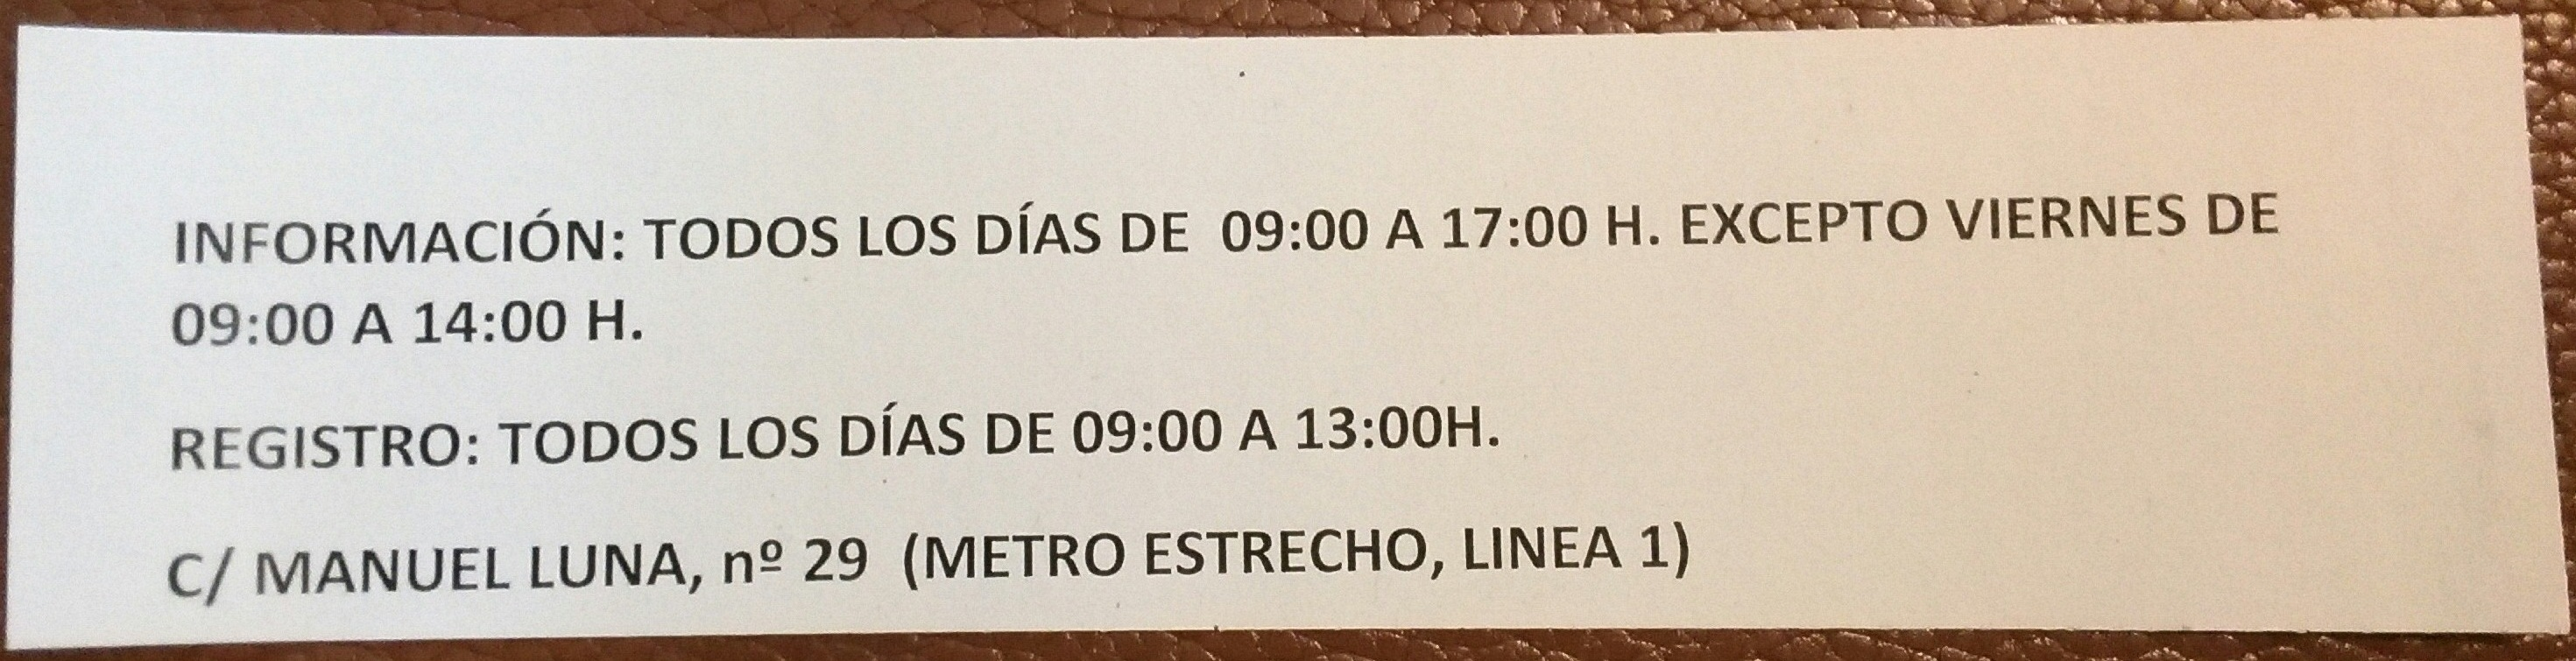 Informaci n oficina de extranjer a manuel luna madrid for Oficina de registro barcelona